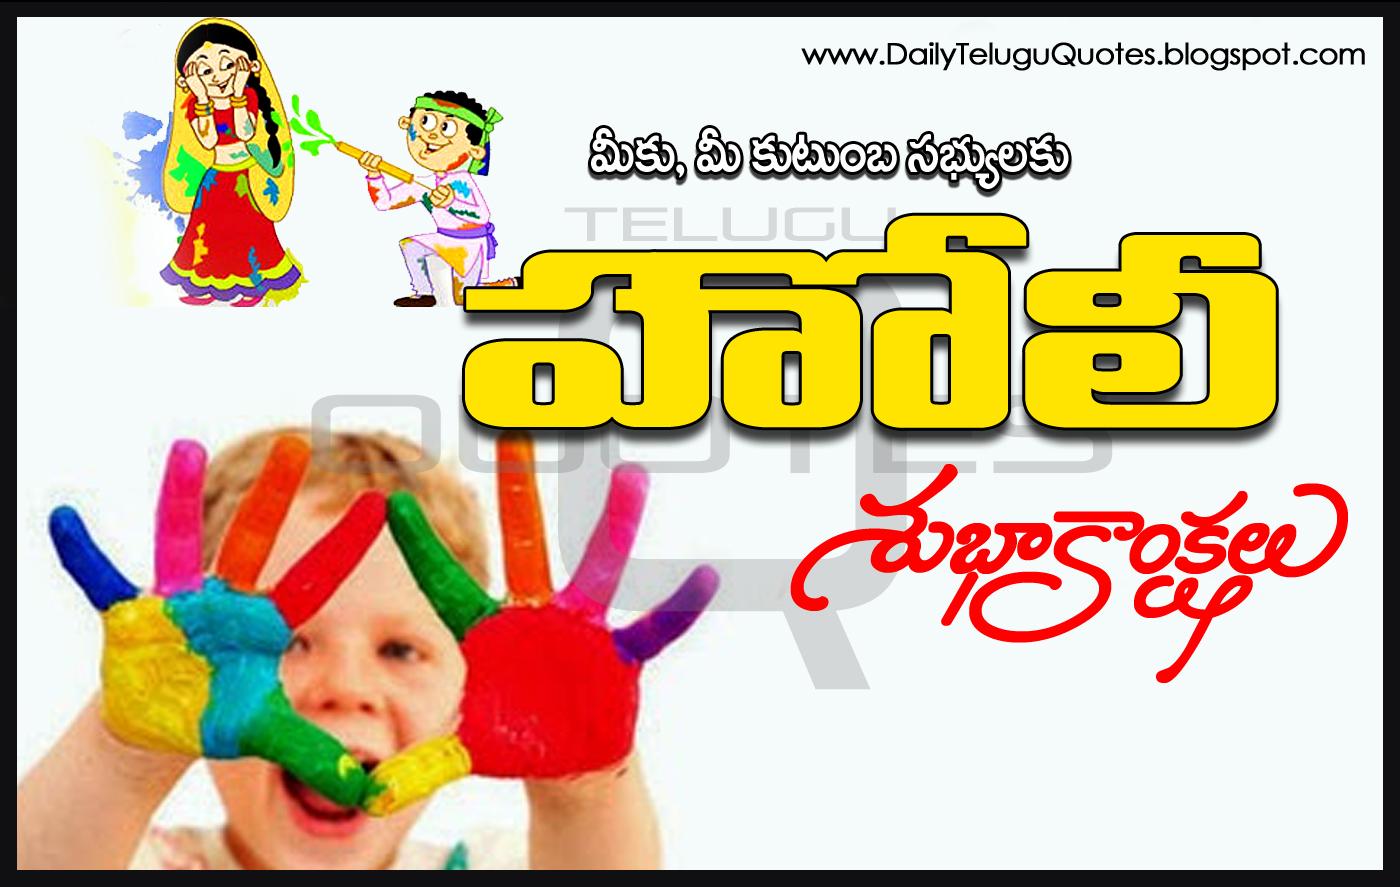 Happy holi wishes in telugu hd wallpapers best greetings telugu holi wishes in telugu holi hd wallpapers holi m4hsunfo